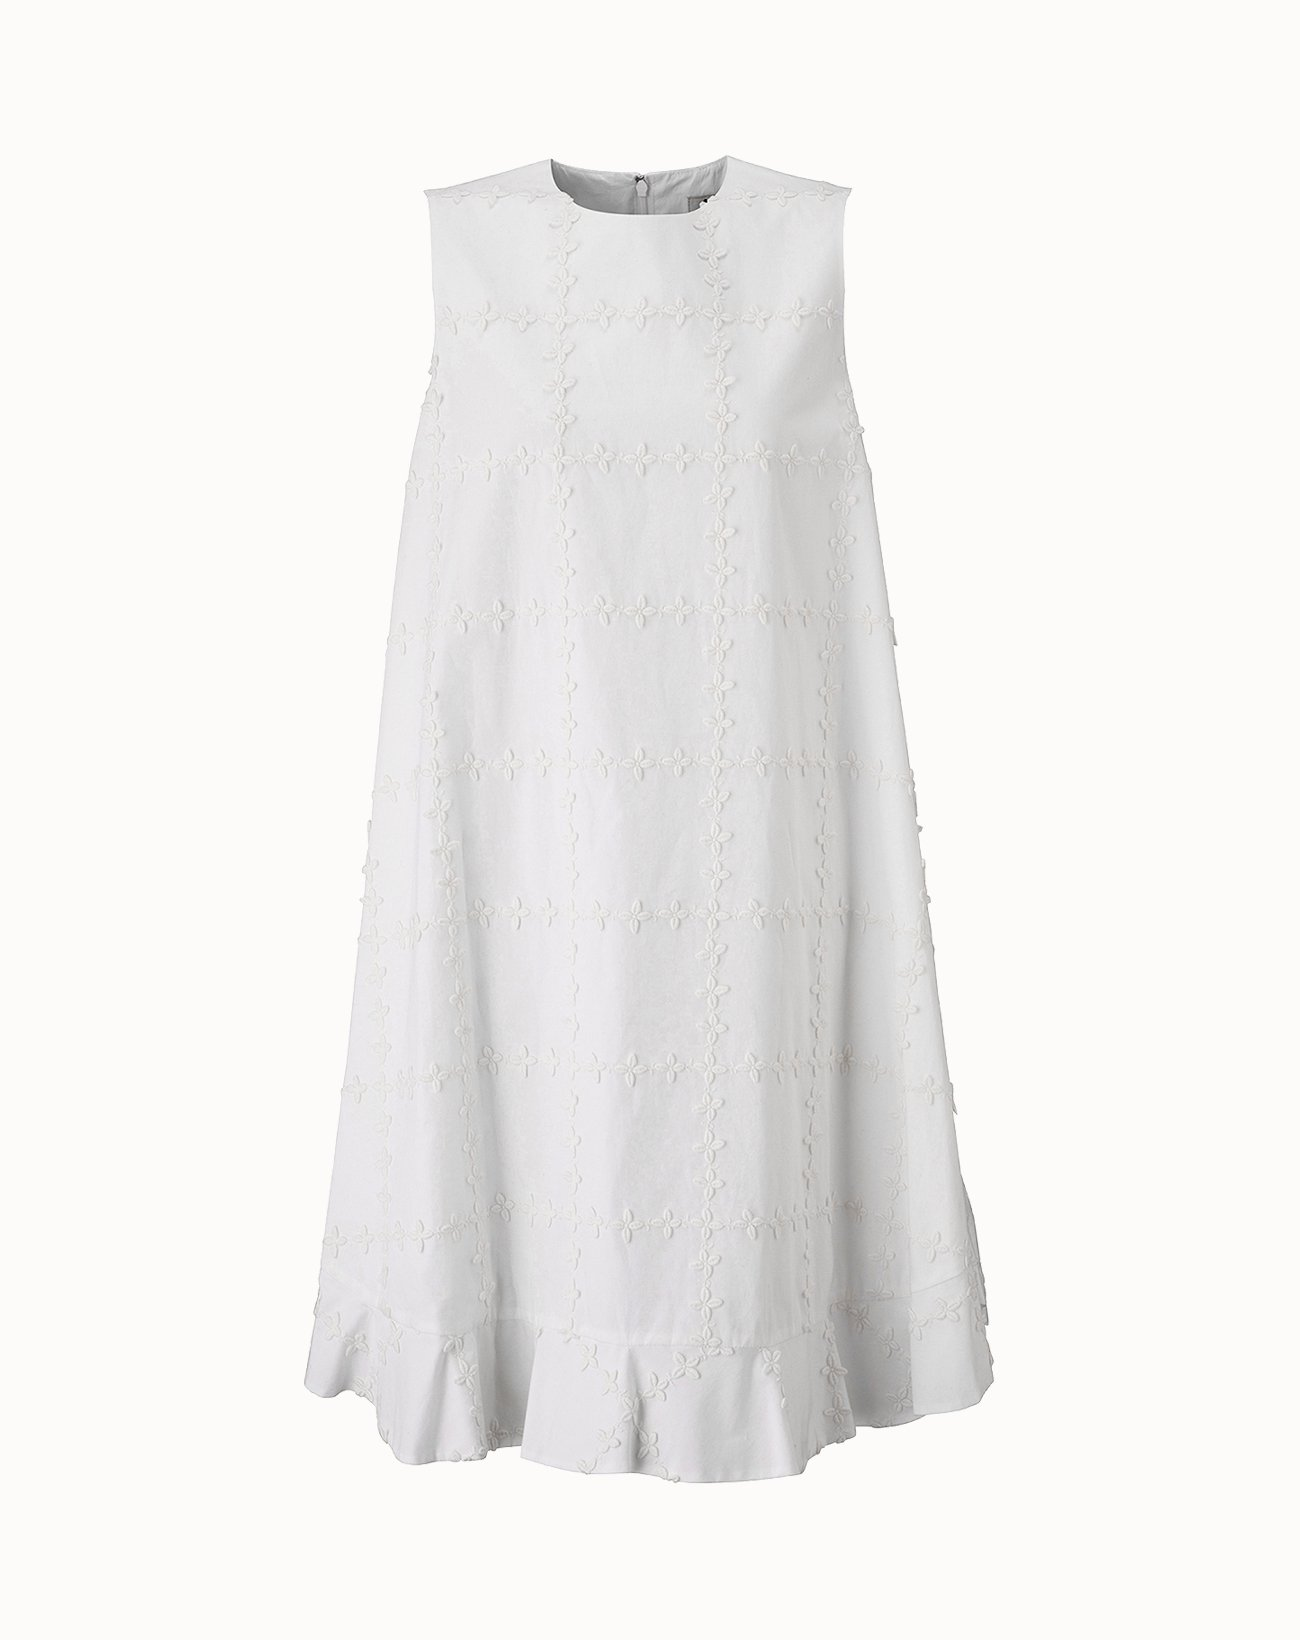 leur logette - Check Flower Embroidery Dress - White